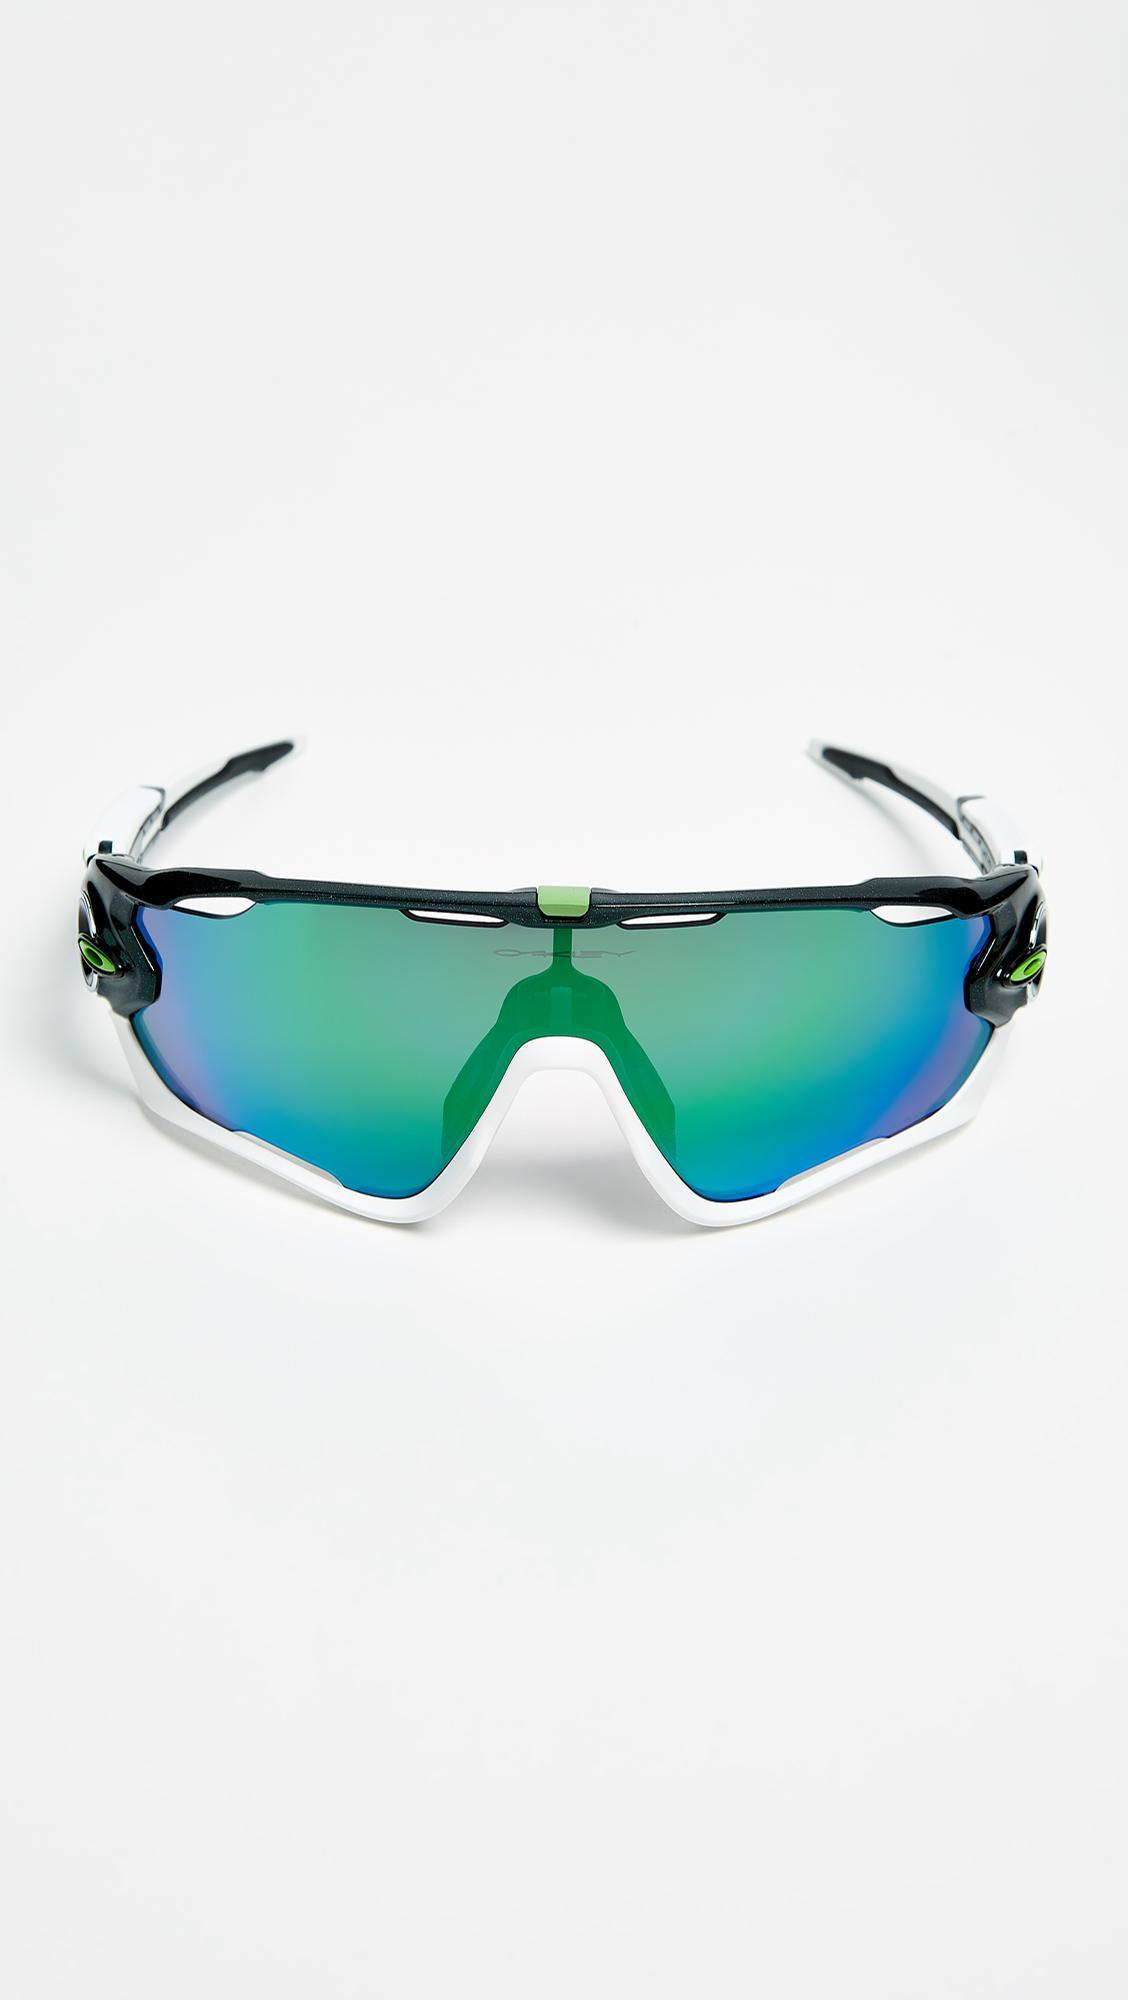 449c6912f5e Lyst - Oakley Jawbreaker Cavendish Sunglasses in Green for Men